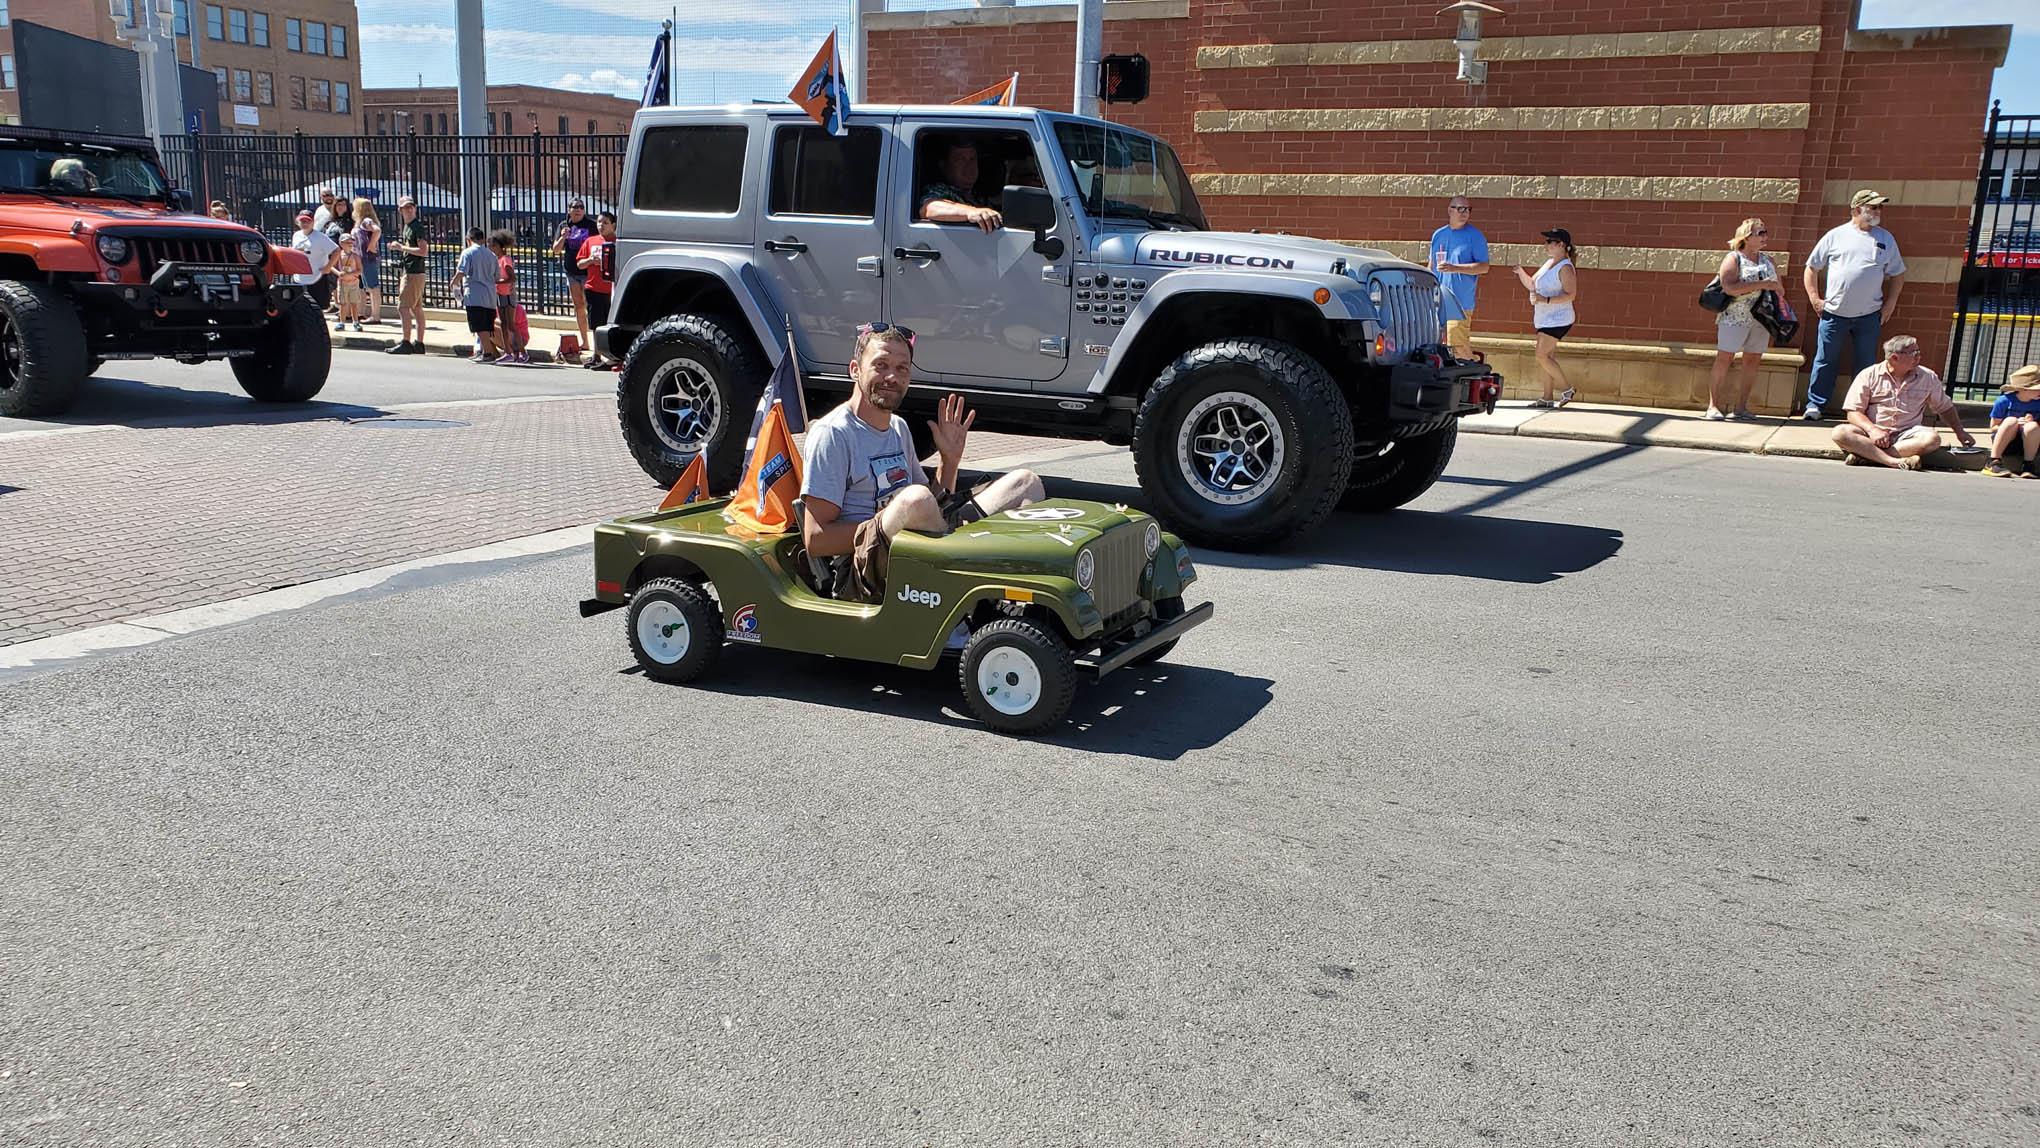 044 toledo jeep fest parade mini